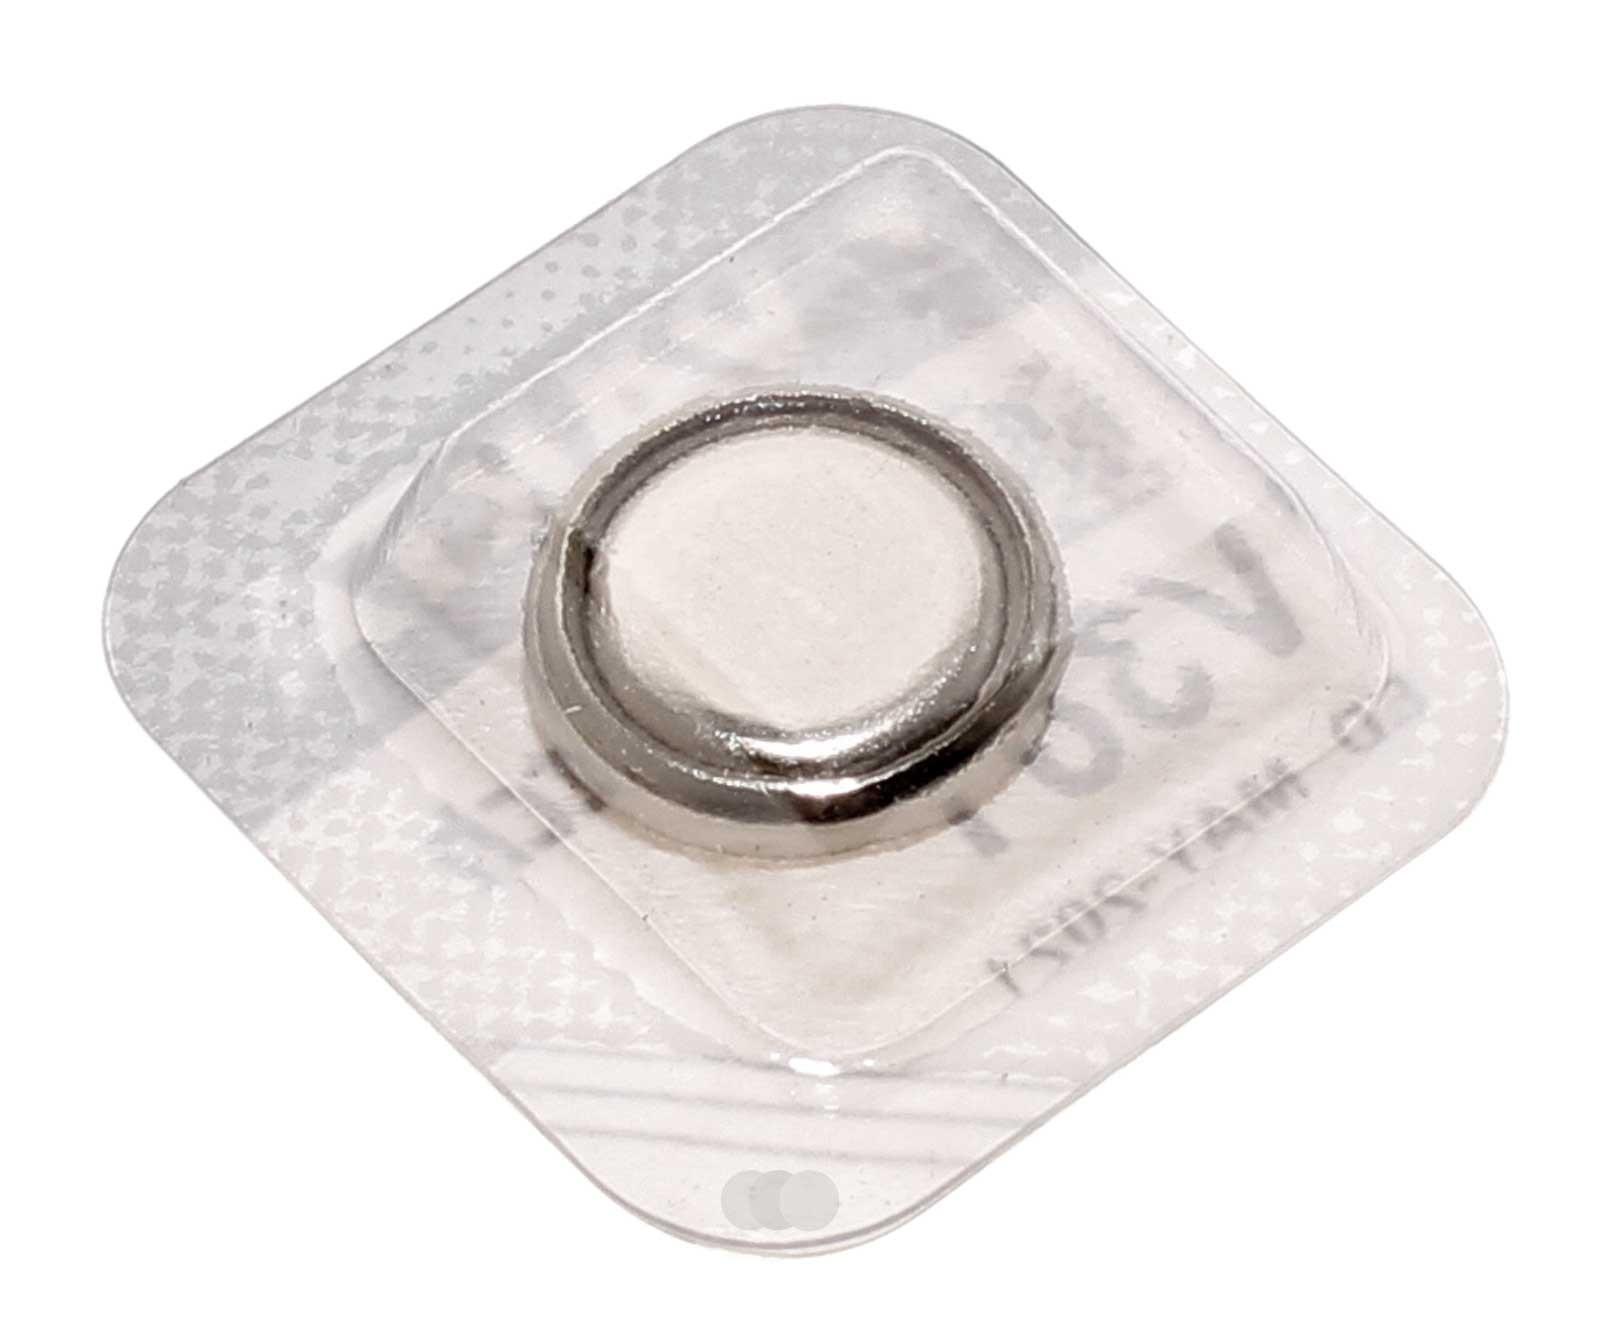 Varta V381 Knopfzelle Batterie Silberoxid für Uhren u.a., wie SR55, 1,55V, 49mAh